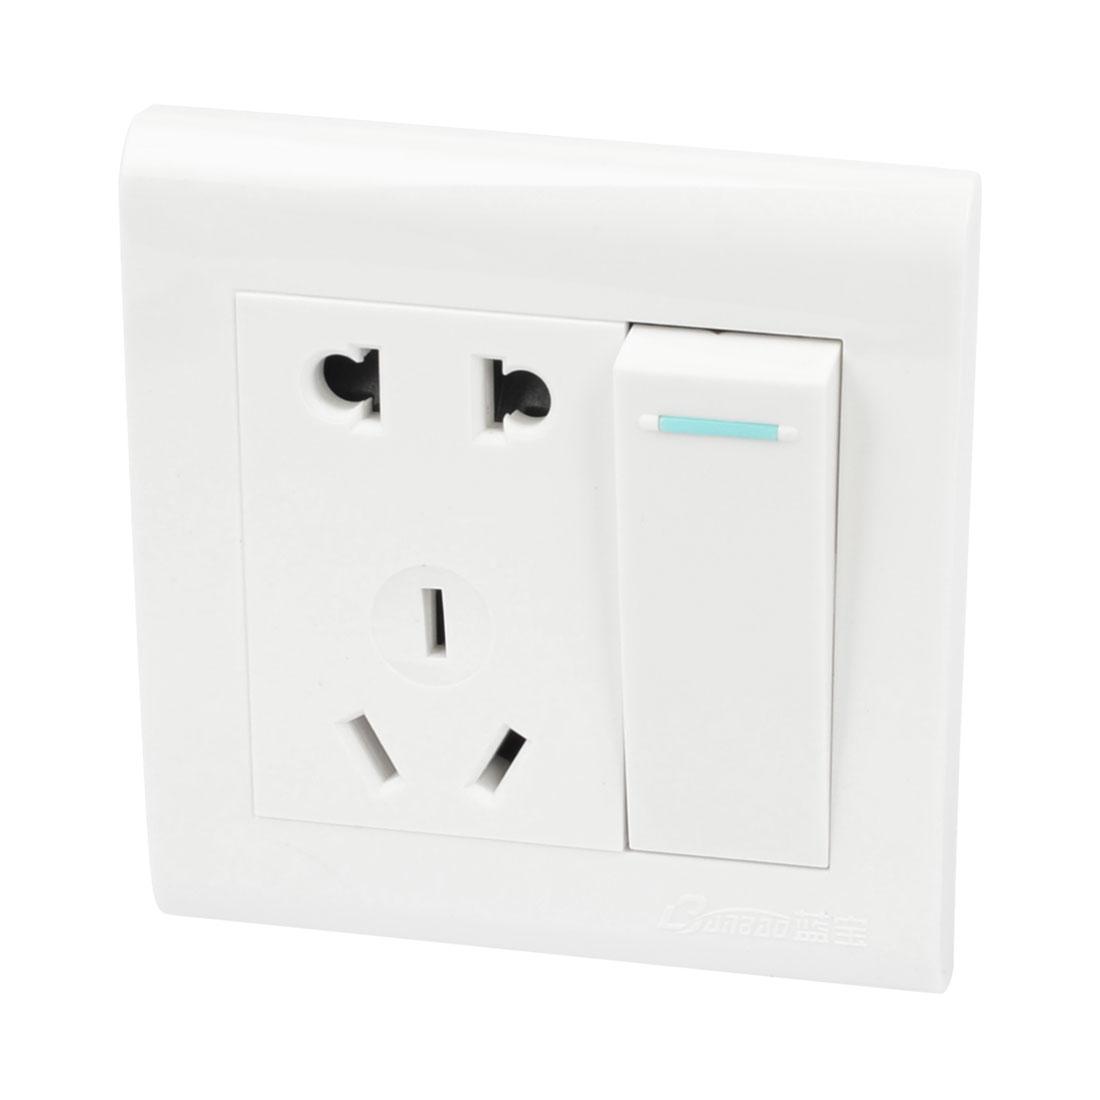 White Shell 3 Pin AU 2 Pin EU US Outlet Socket Single Gang Wall Panel 250VAC 10A